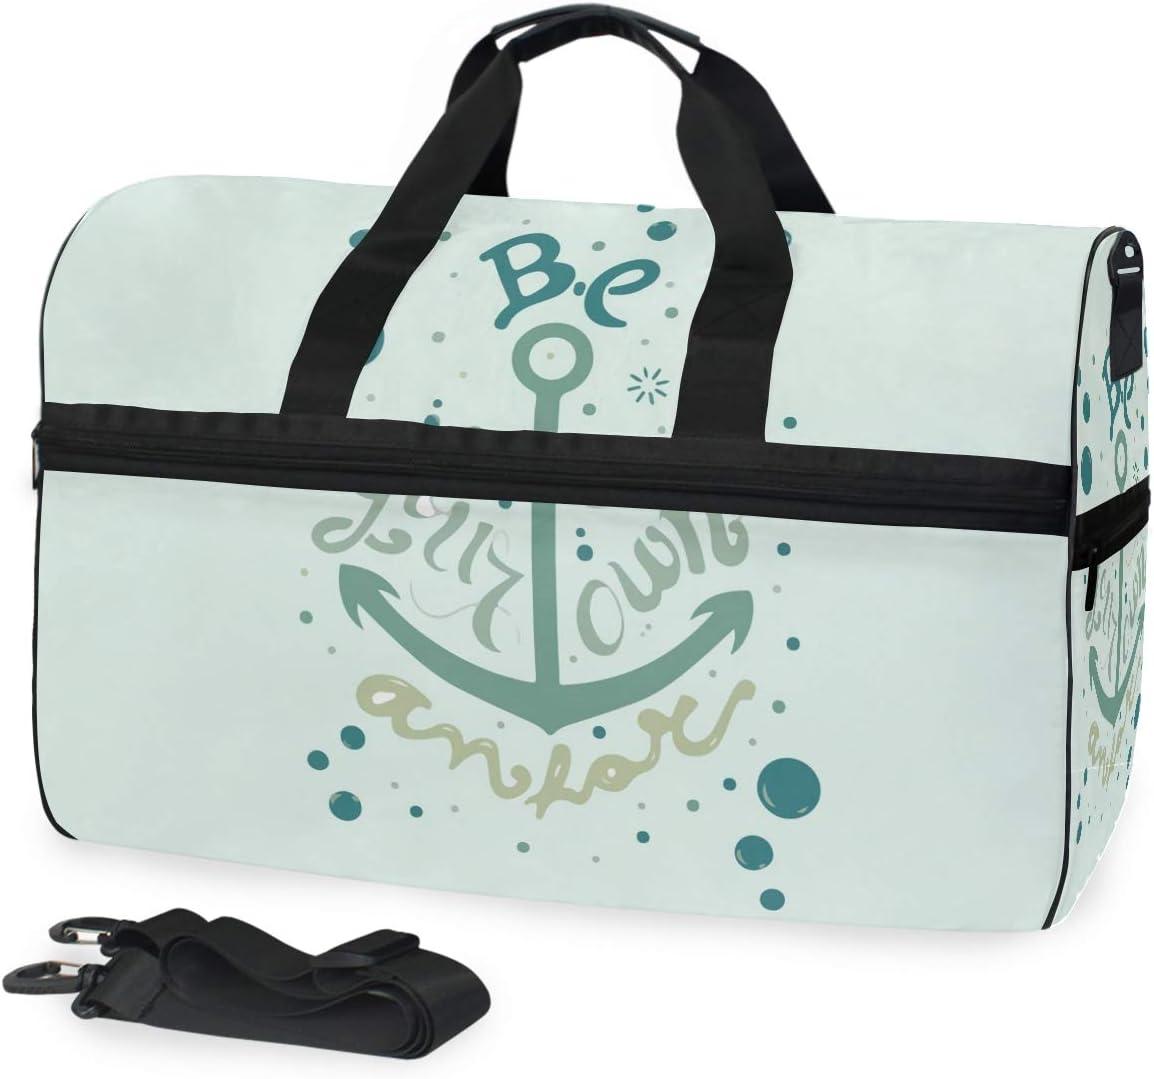 FAJRO Duffle Bag for Women Men Aqua Anchor Travel Duffel Bag Large Size Water-proof Tear Resistant